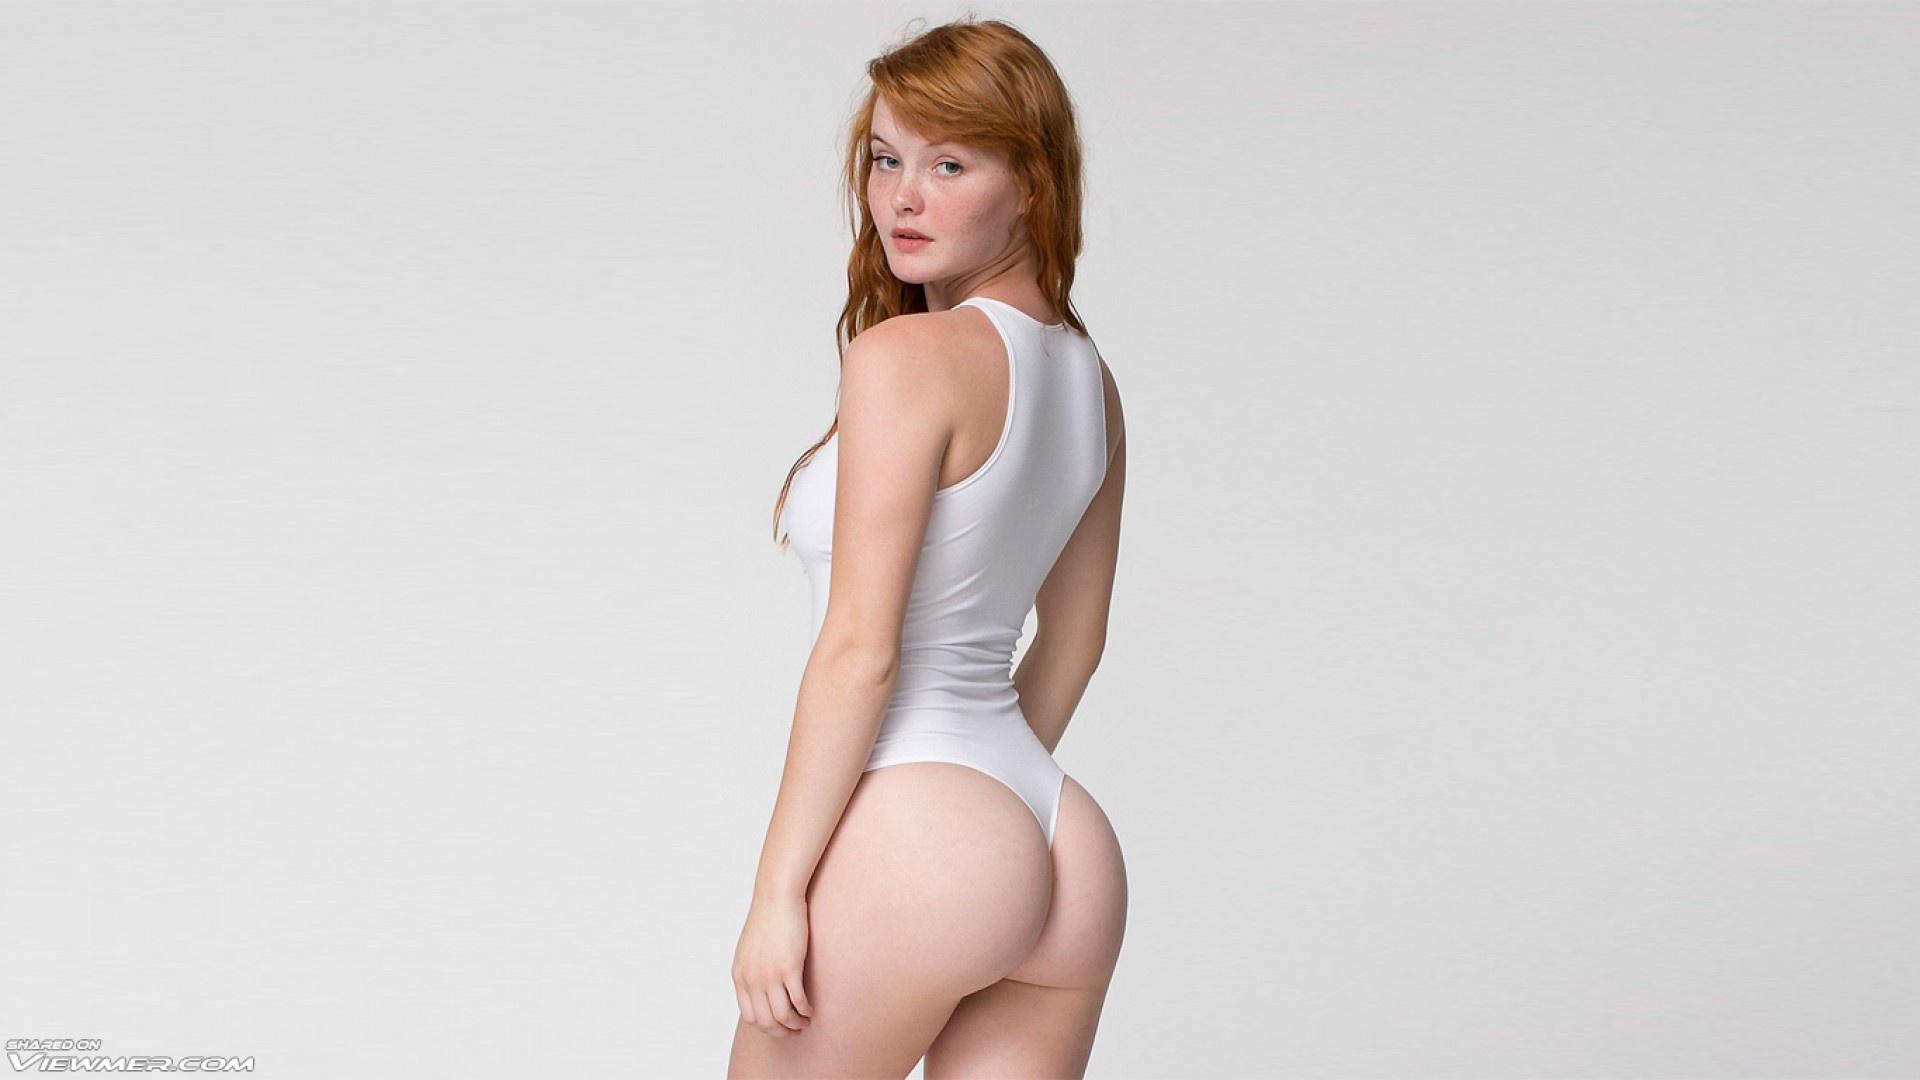 Sexy Lingerie  Womens Underwear  Hot Lingerie  Lovehoney